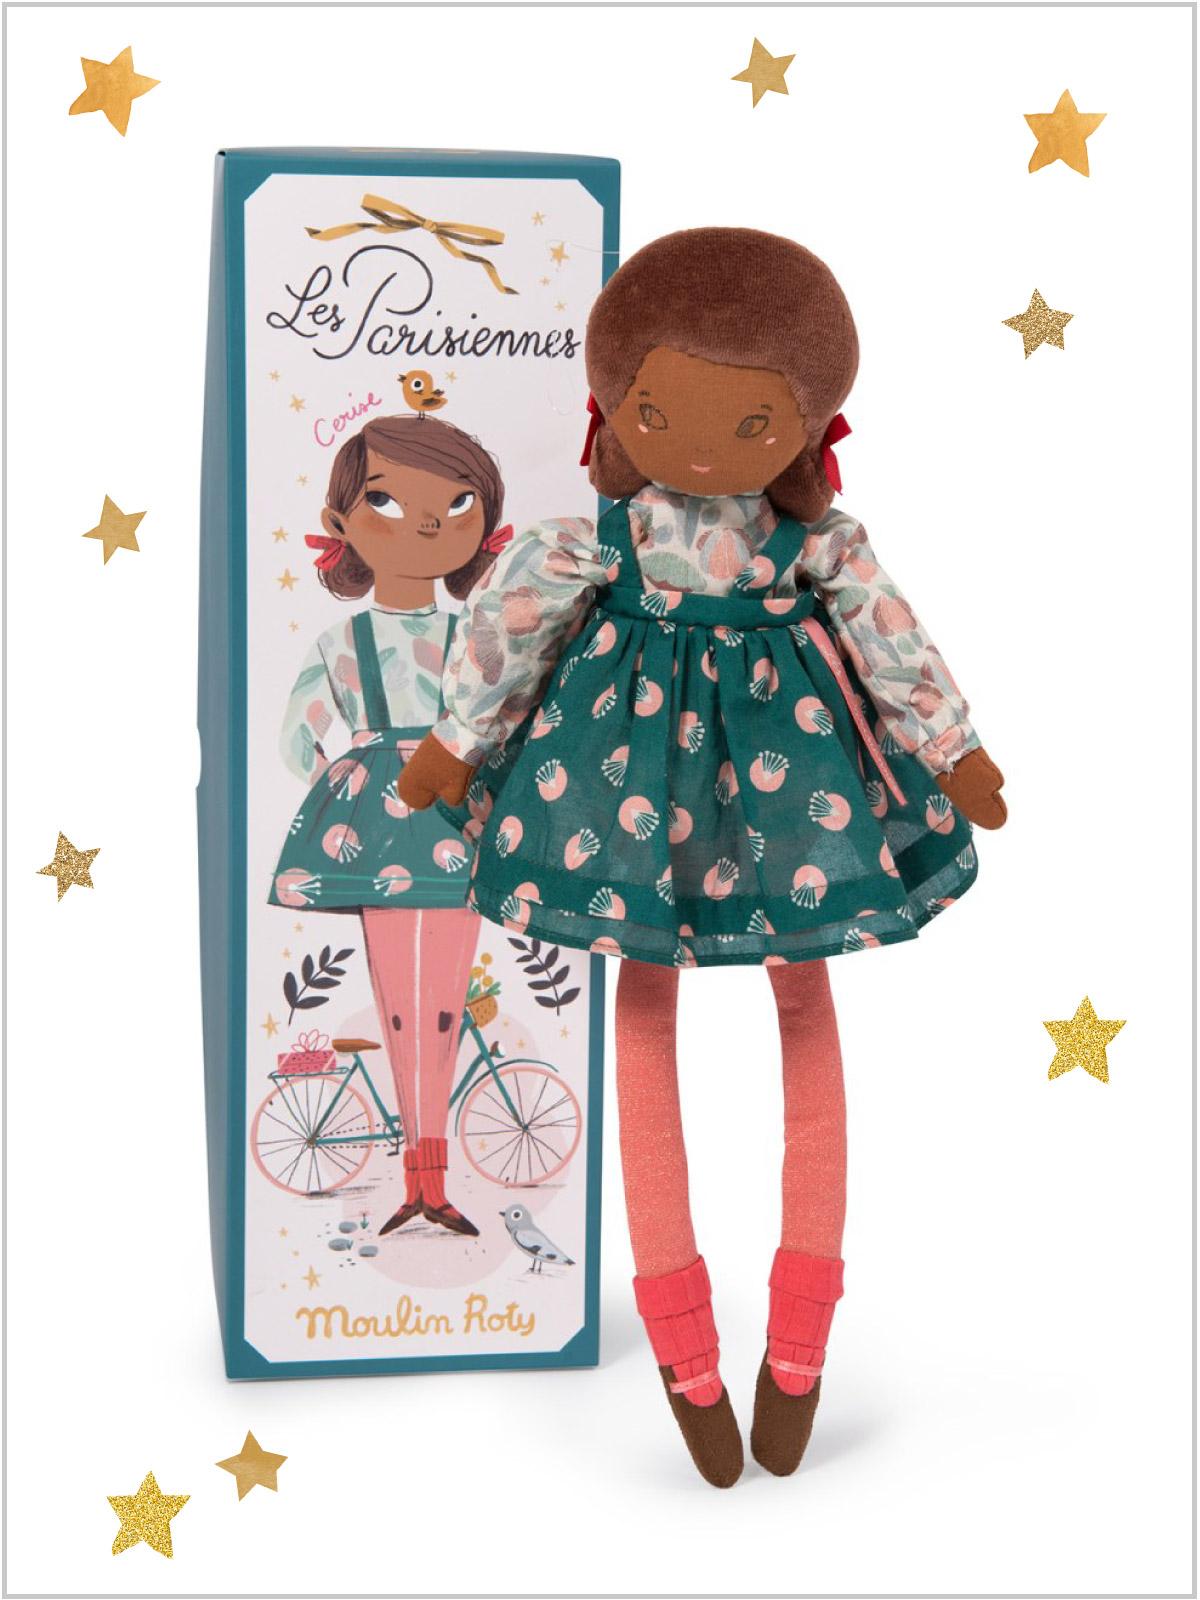 frederickandsophie-kids-toys-moulin-roty-les_parisiennes_Cerise_doll